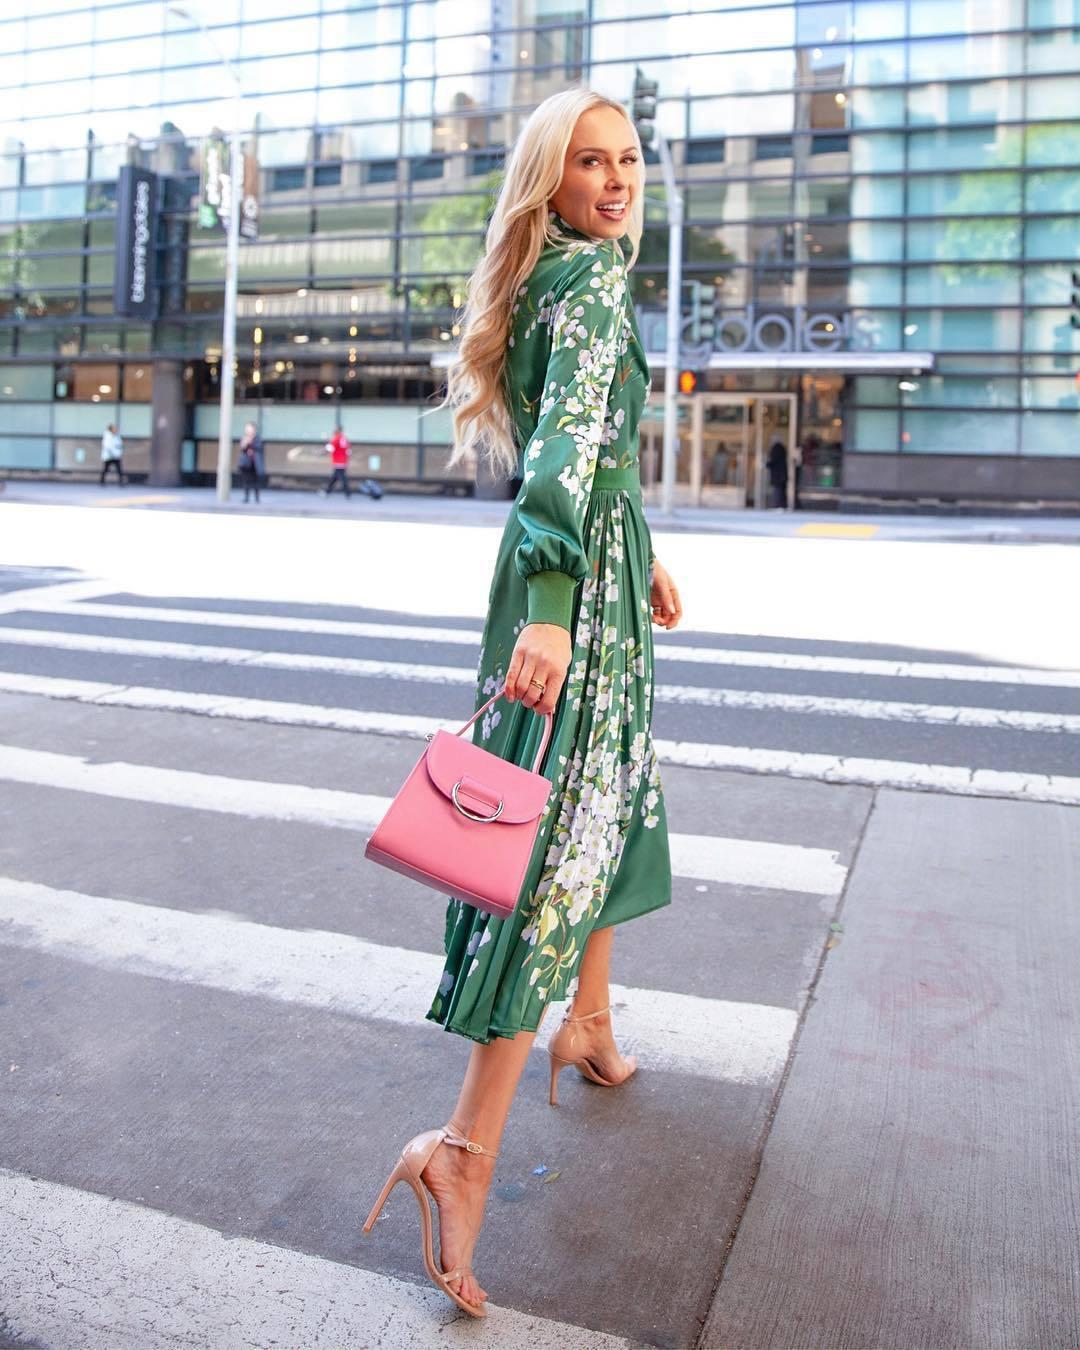 dress midi dress floral dress long sleeve dress sandals pink bag